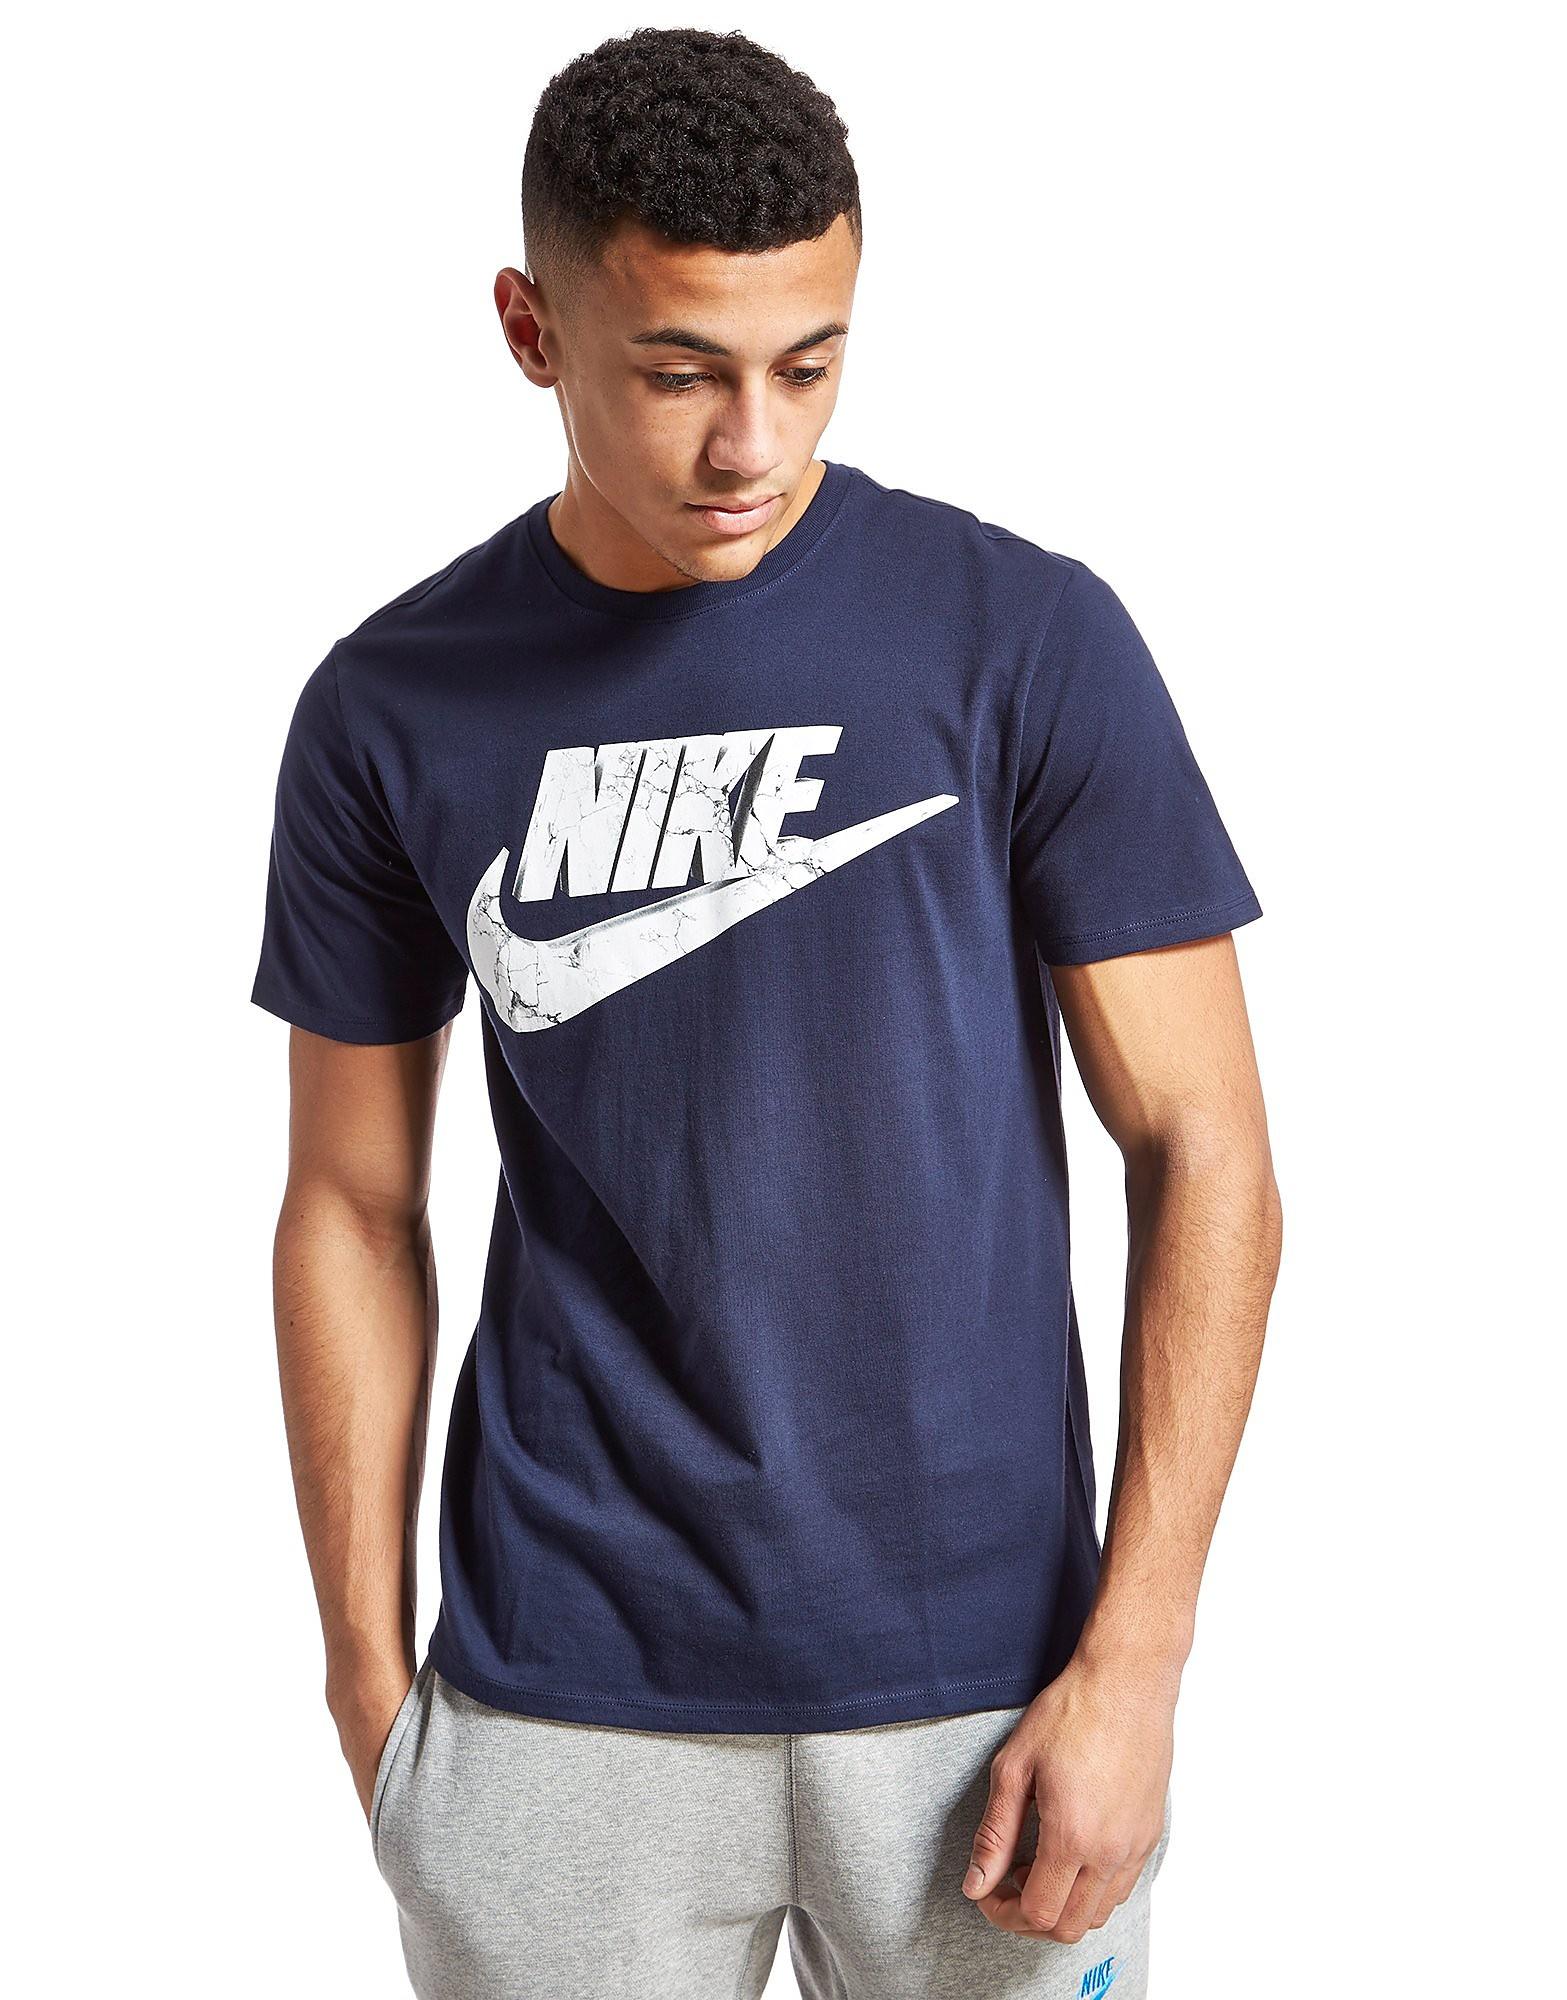 Nike Marble-t-shirt